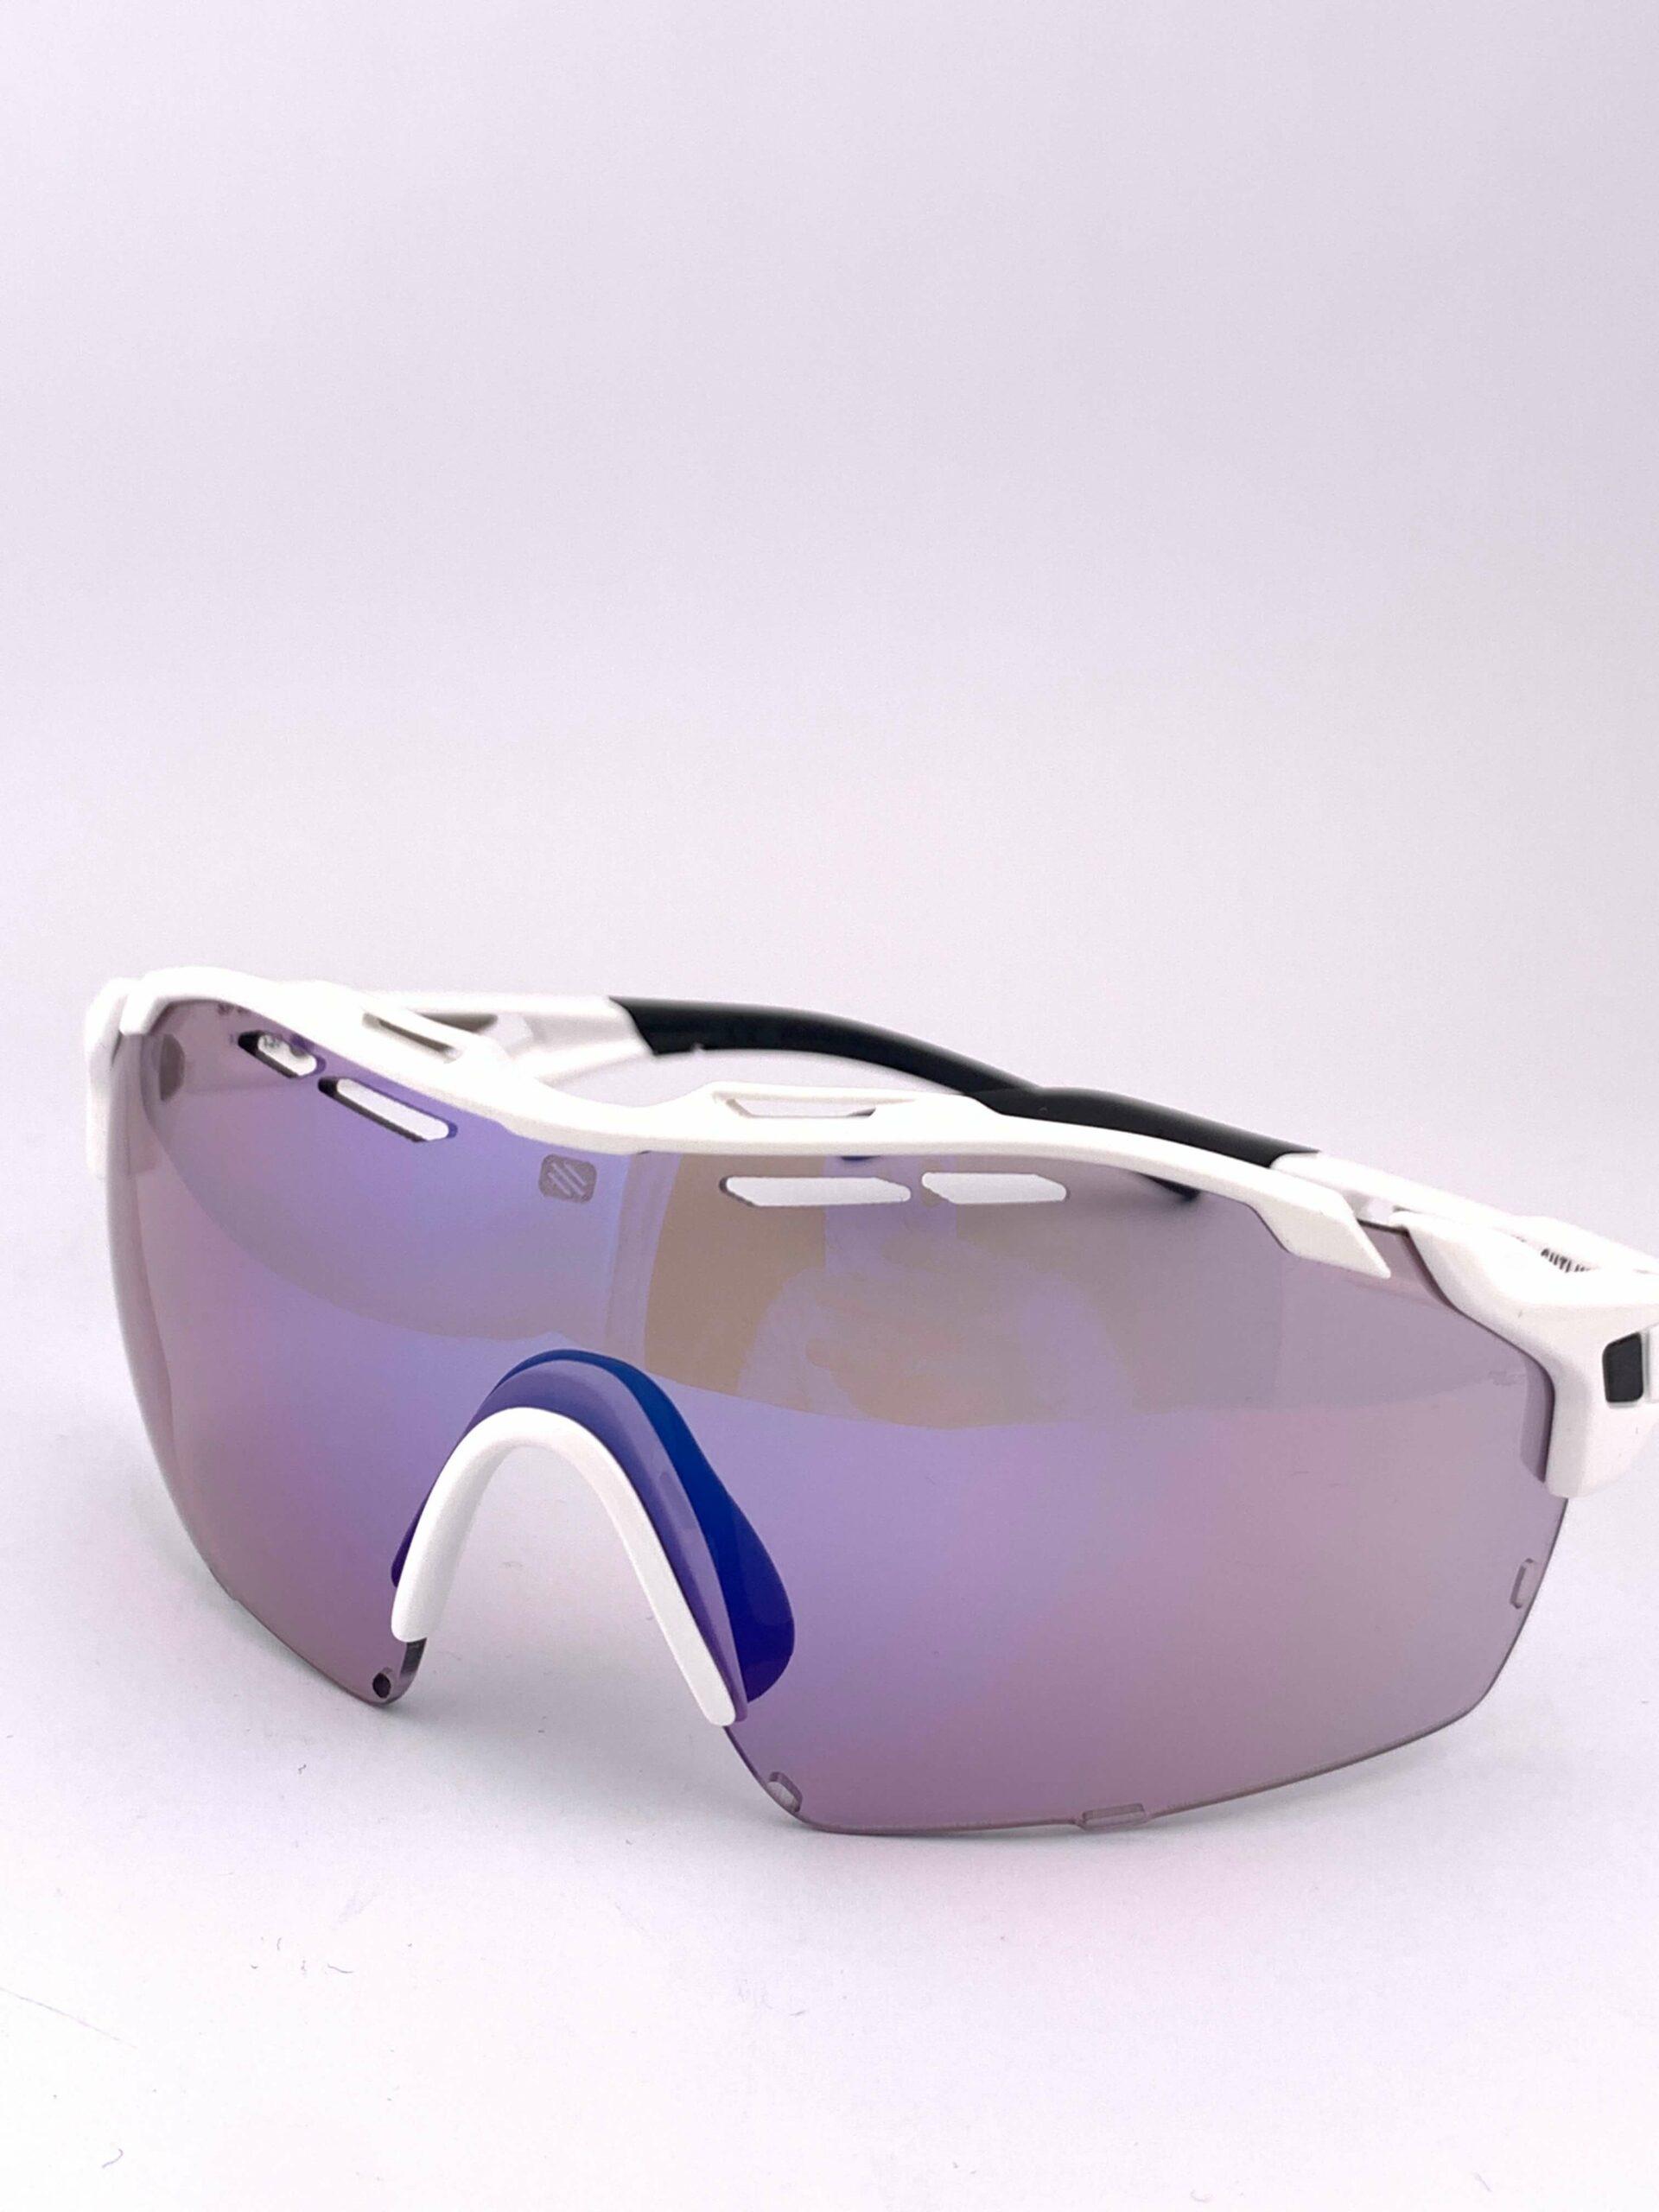 Cyklistické okuliare Cutline biele bok zprava